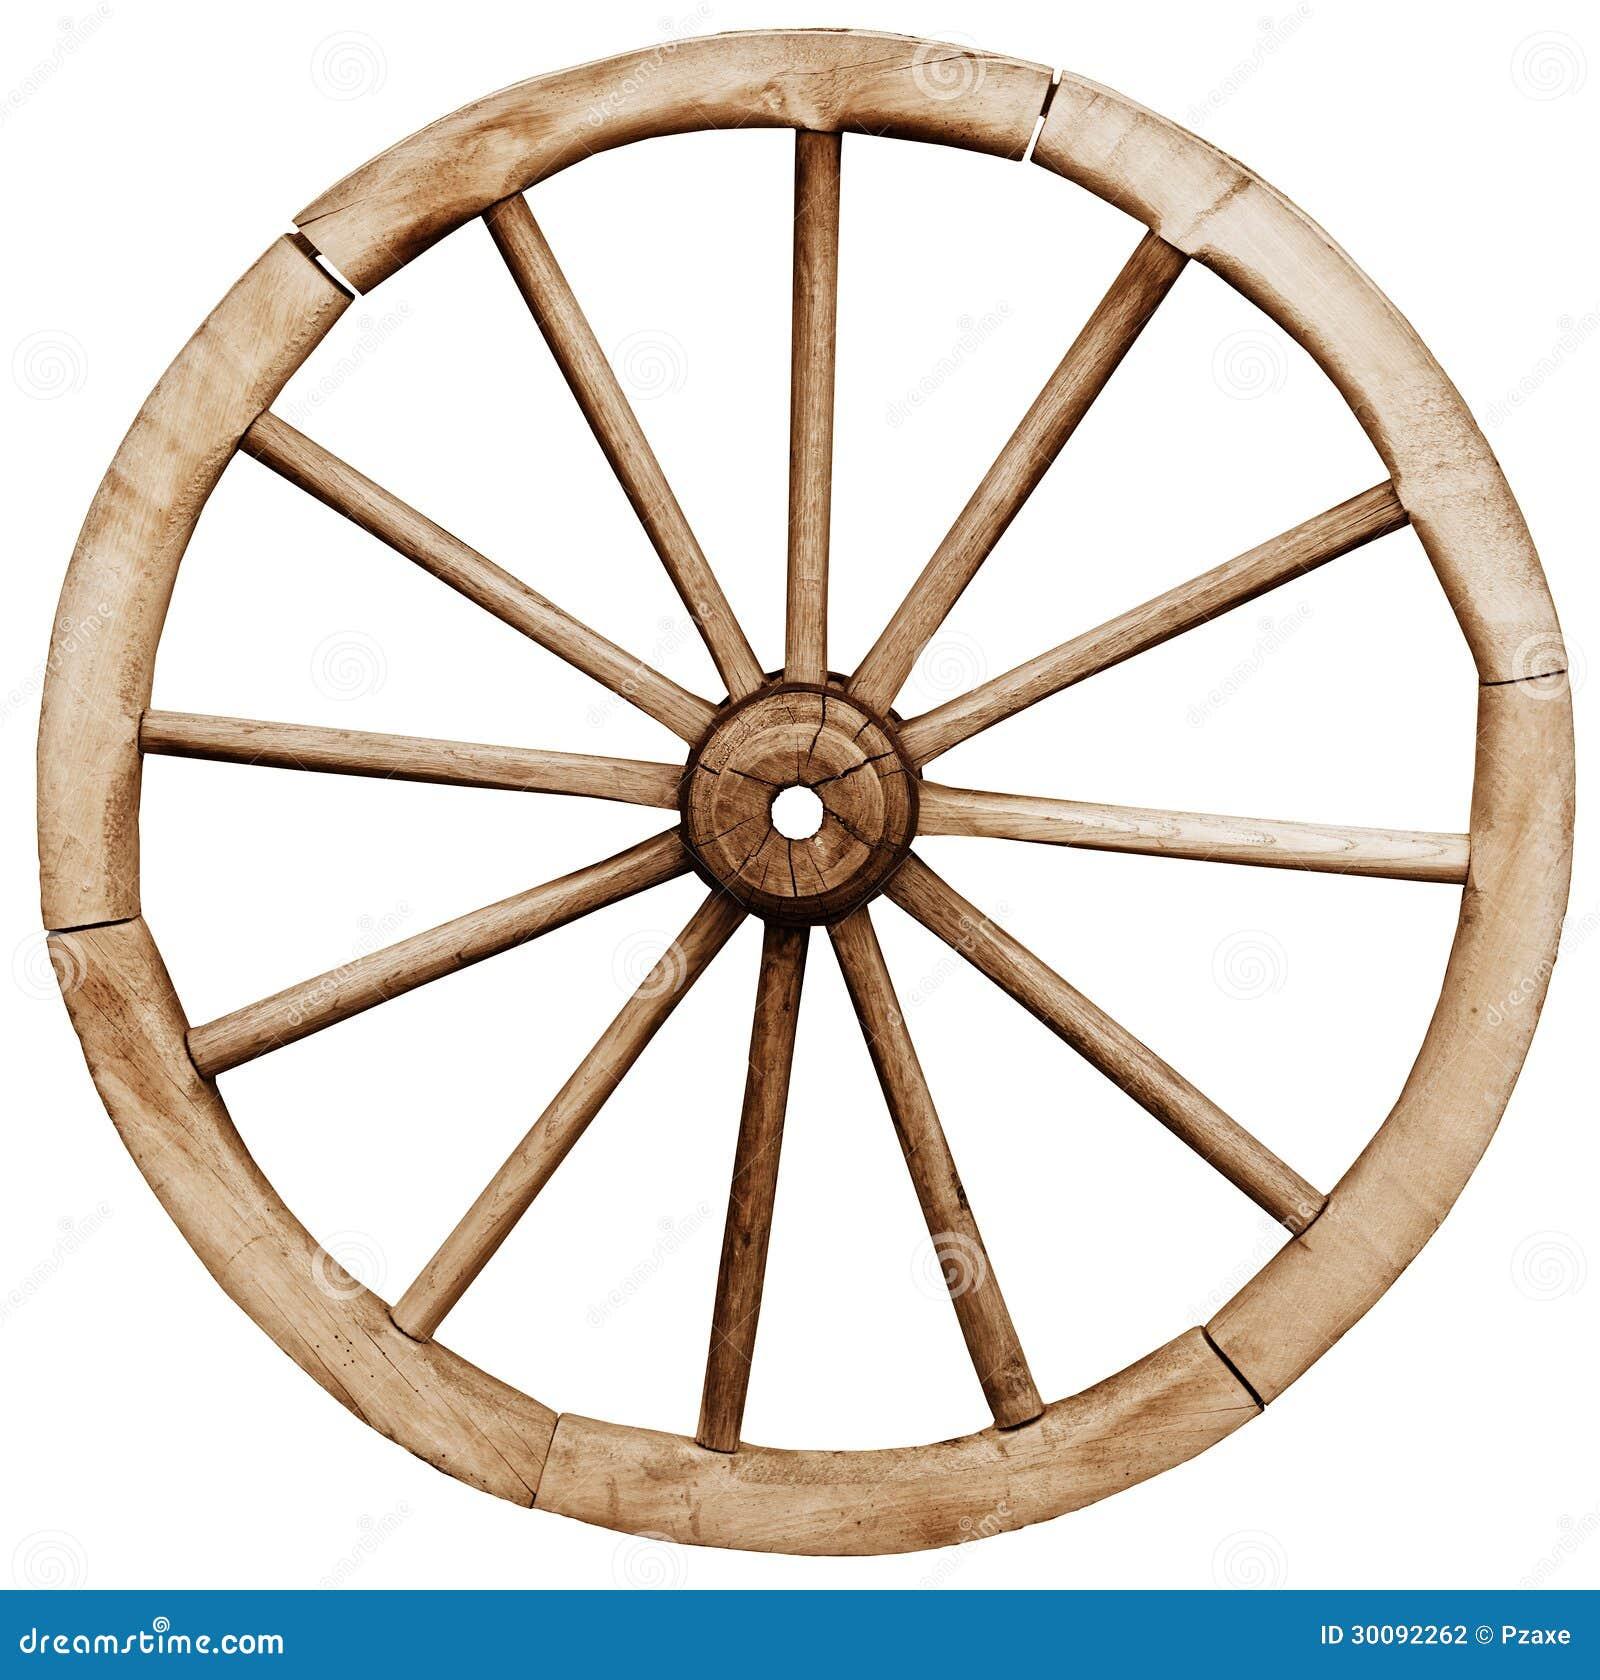 Big Vintage Rustic Wagon Wheel Stock Photo - Image of ...